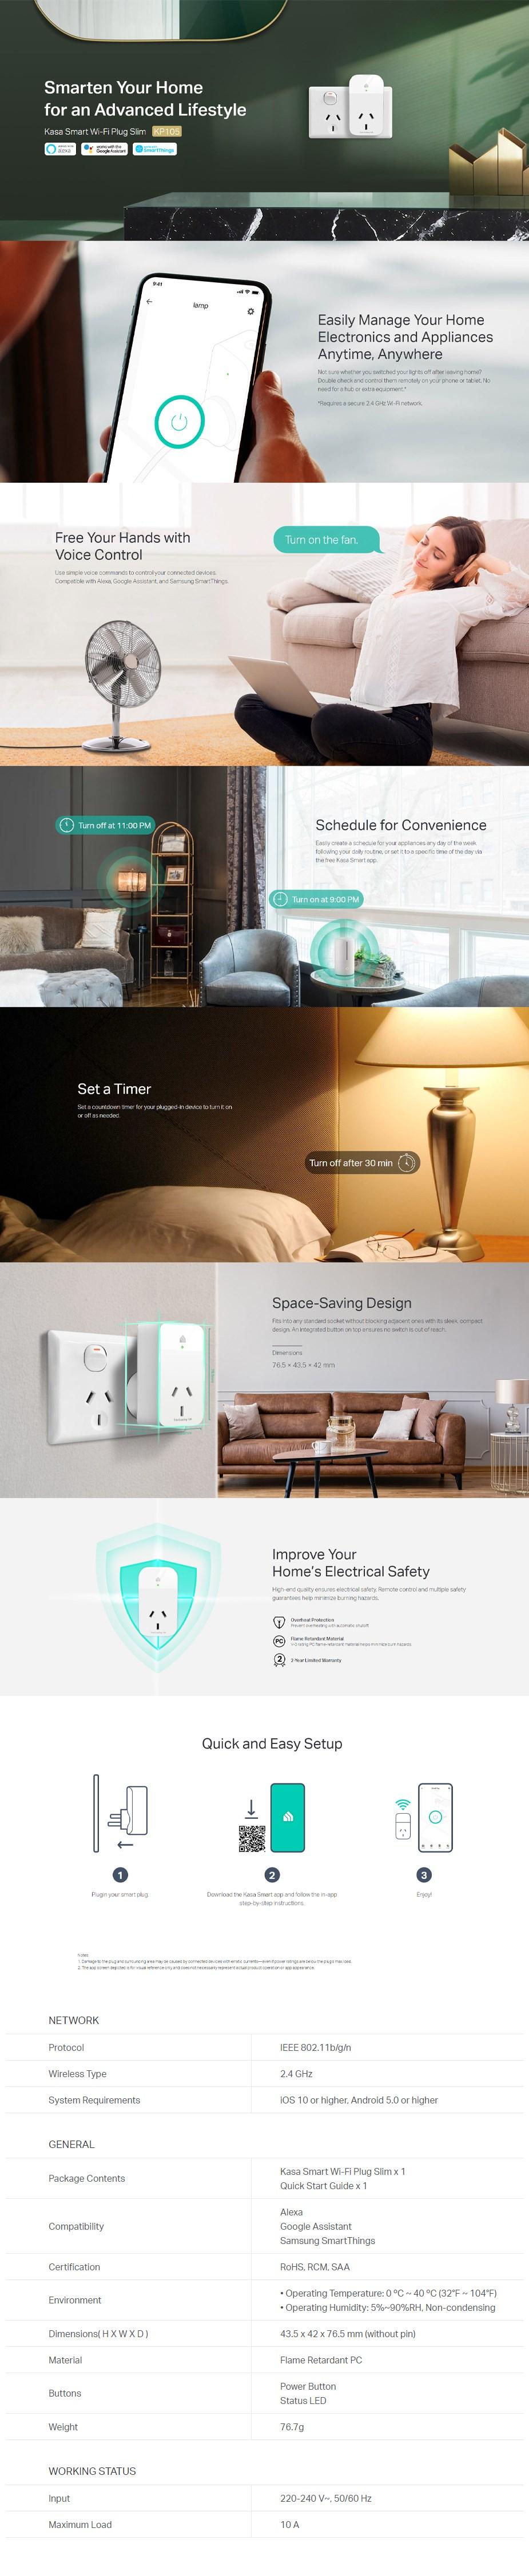 TP-Link Kasa KP105 Smart Wi-Fi Plug Slim - Overview 1